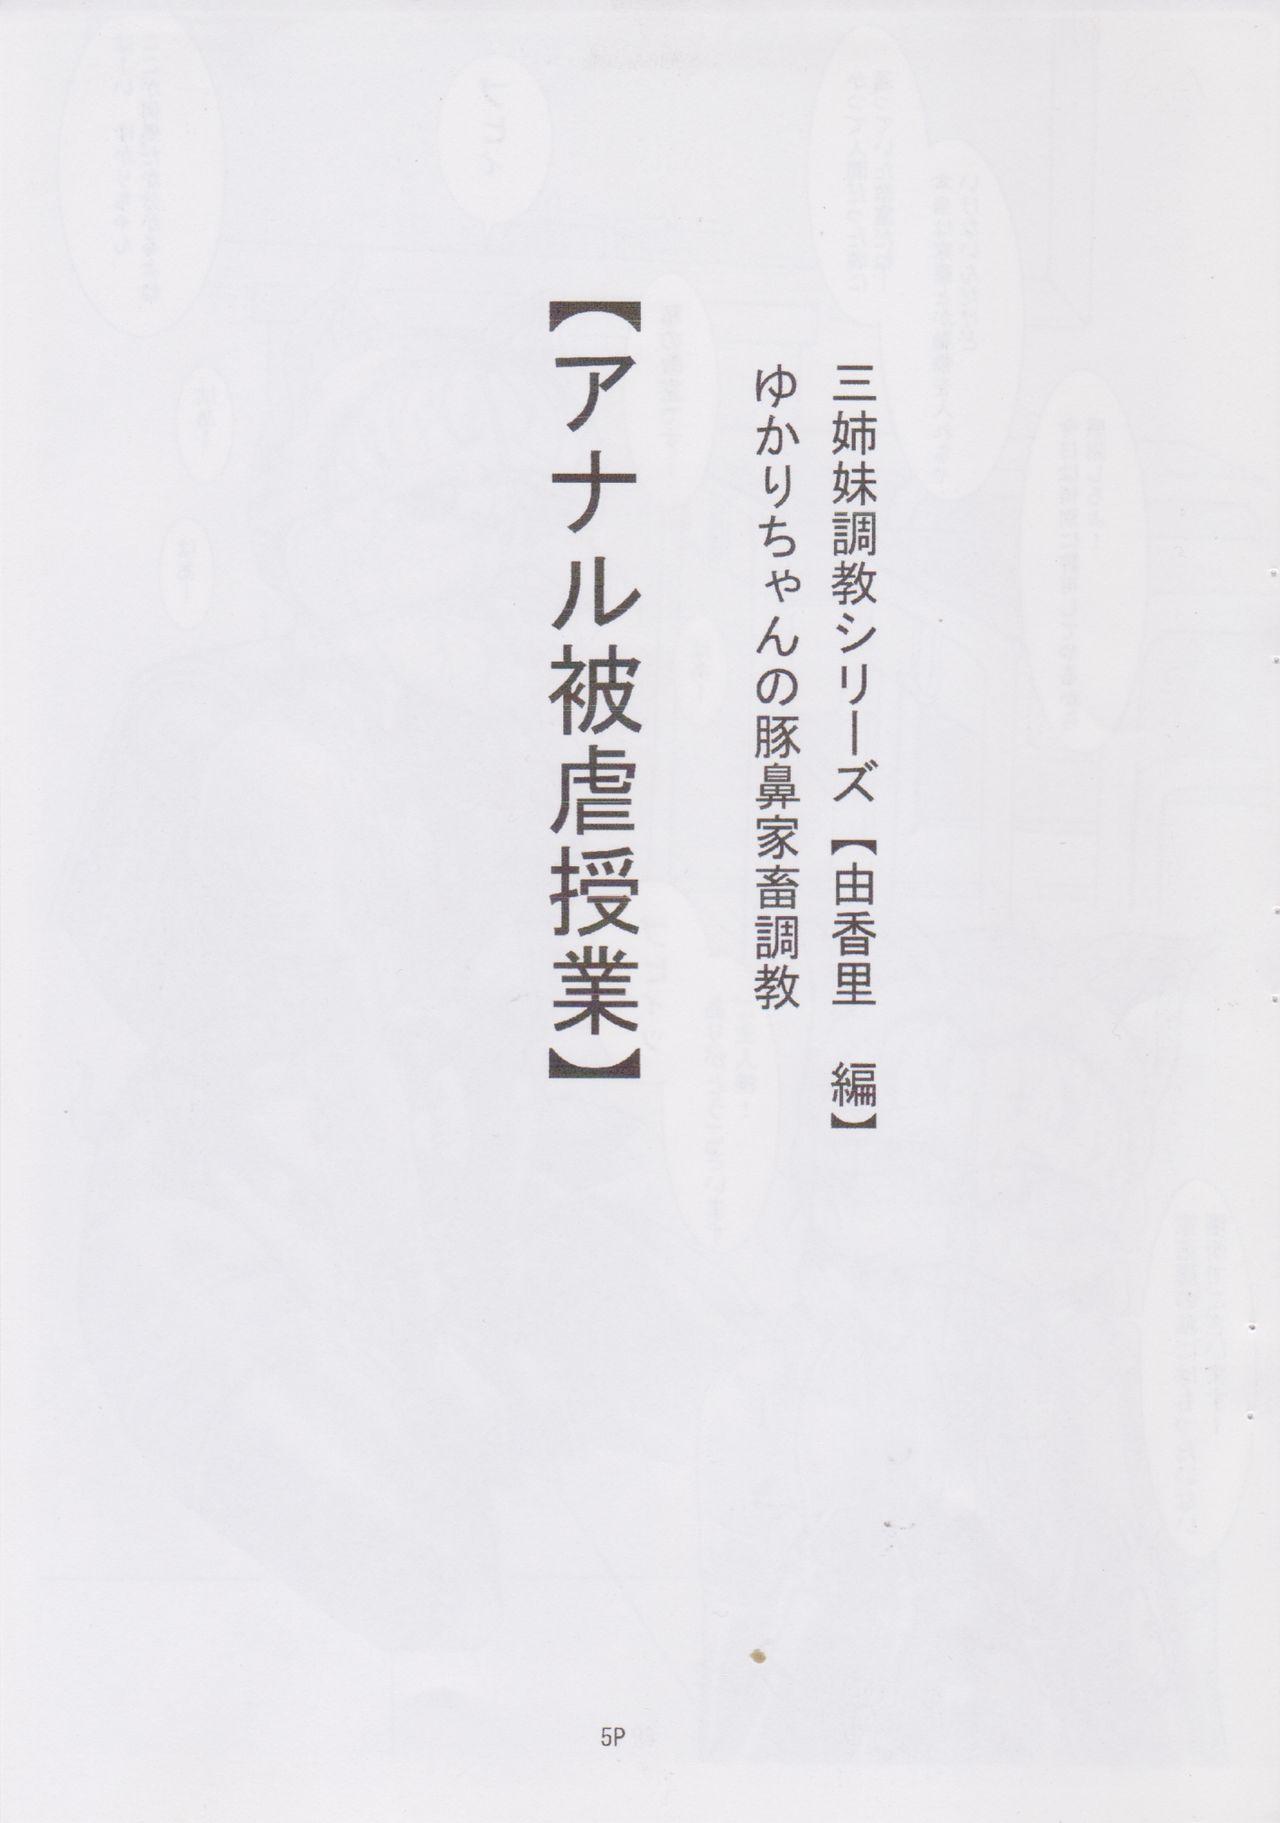 (C78) [Nekoneko Panchu! (Nekoneko Panchu)] Sanshimai Choukyou Yuugi [Yukari Hen] Yukari-chan no Butabana Kachiku Choukyou [Anal Higyaku Jugyou] 4